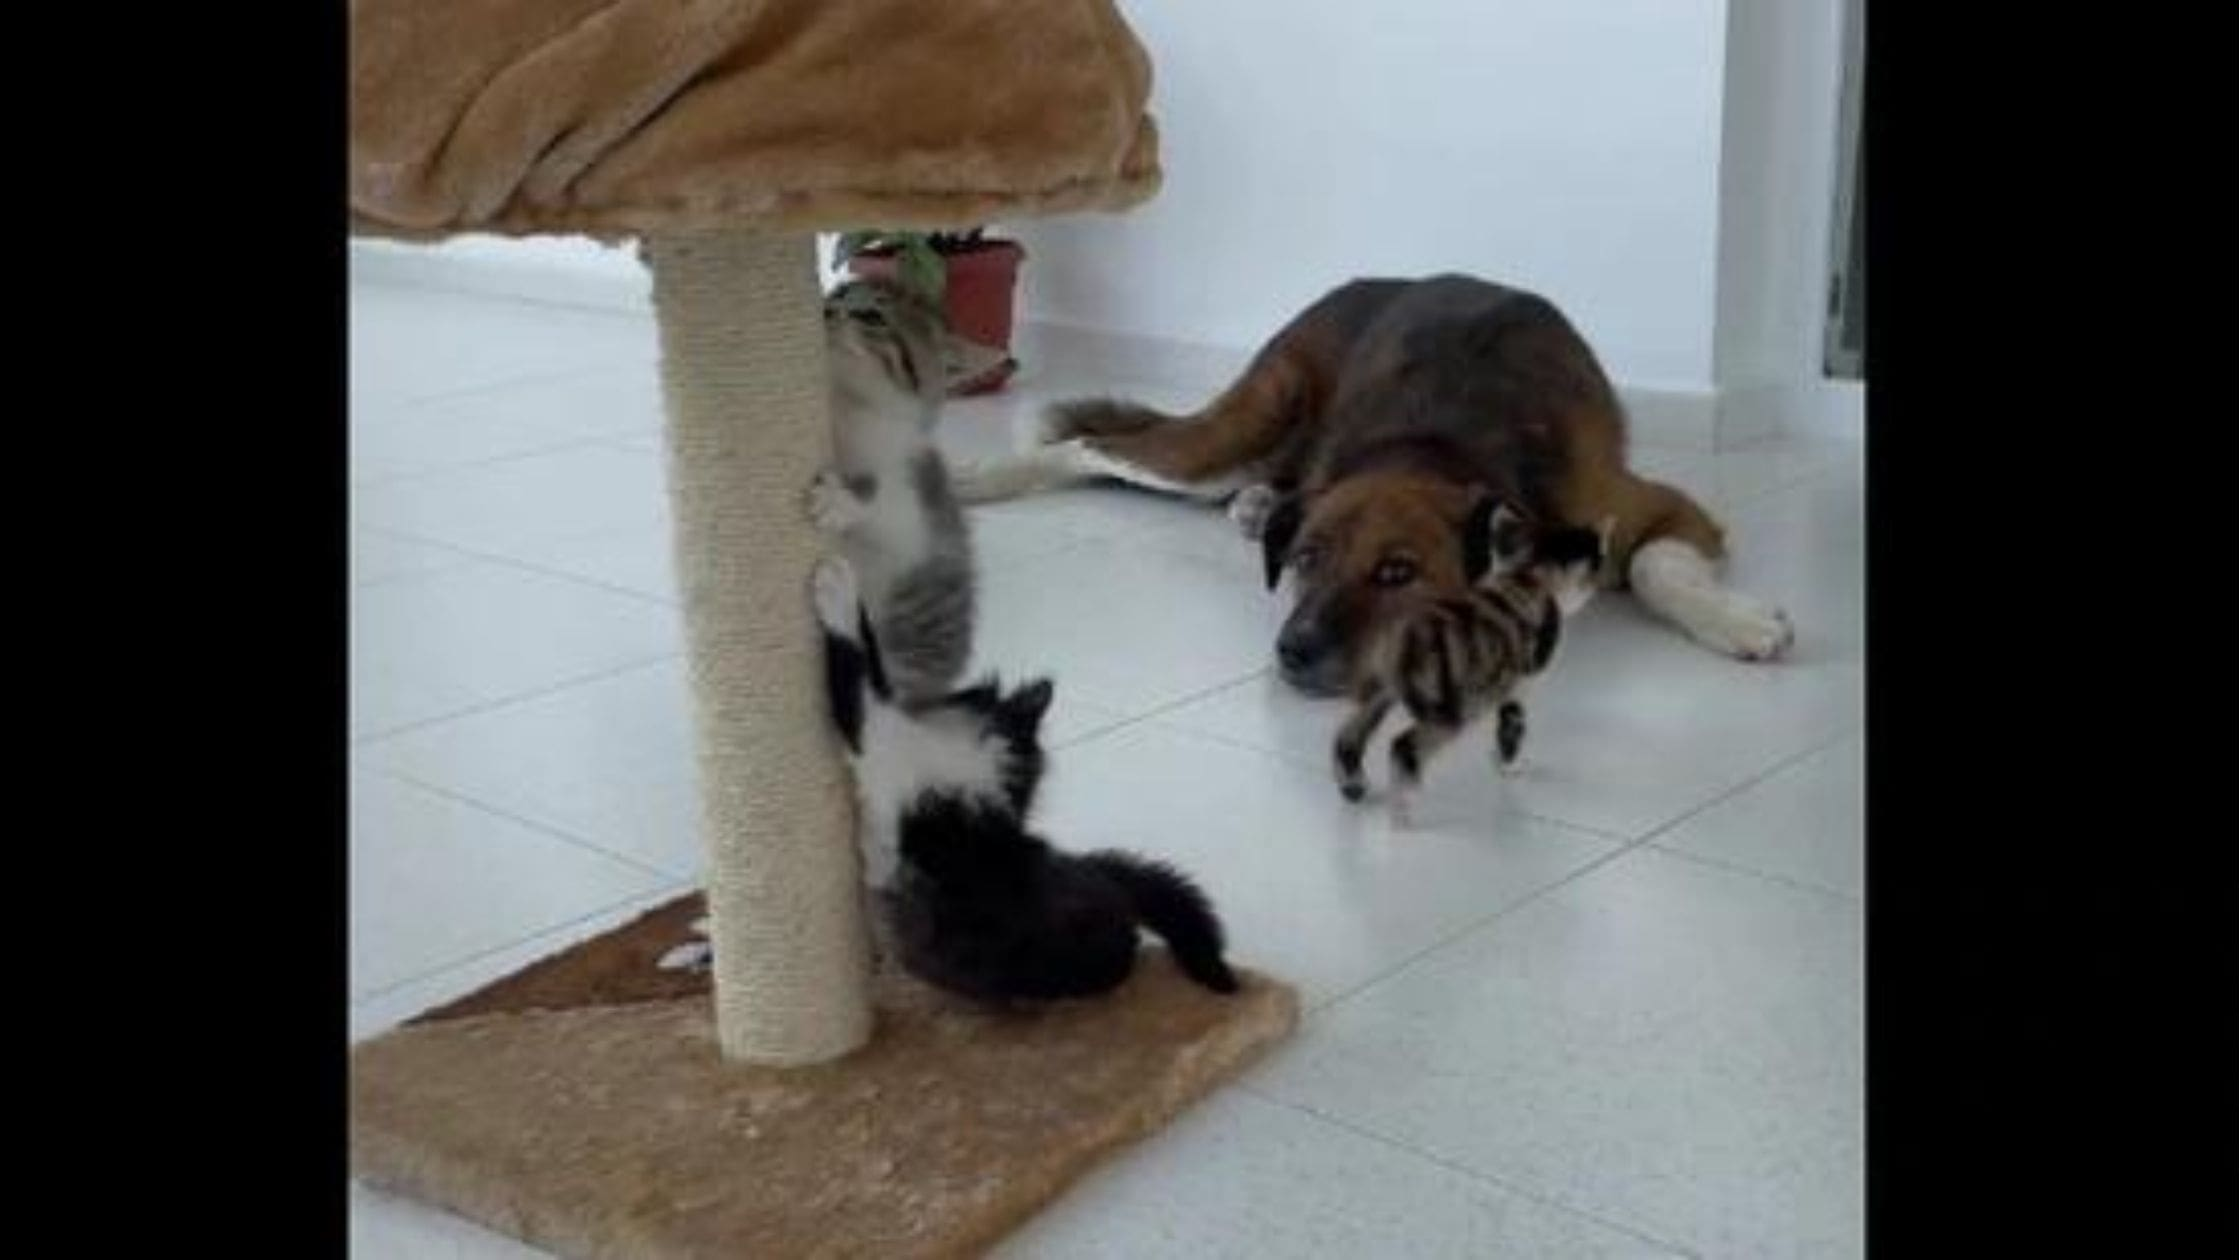 Dog Babysitting 3 Kittens Video Went Viral